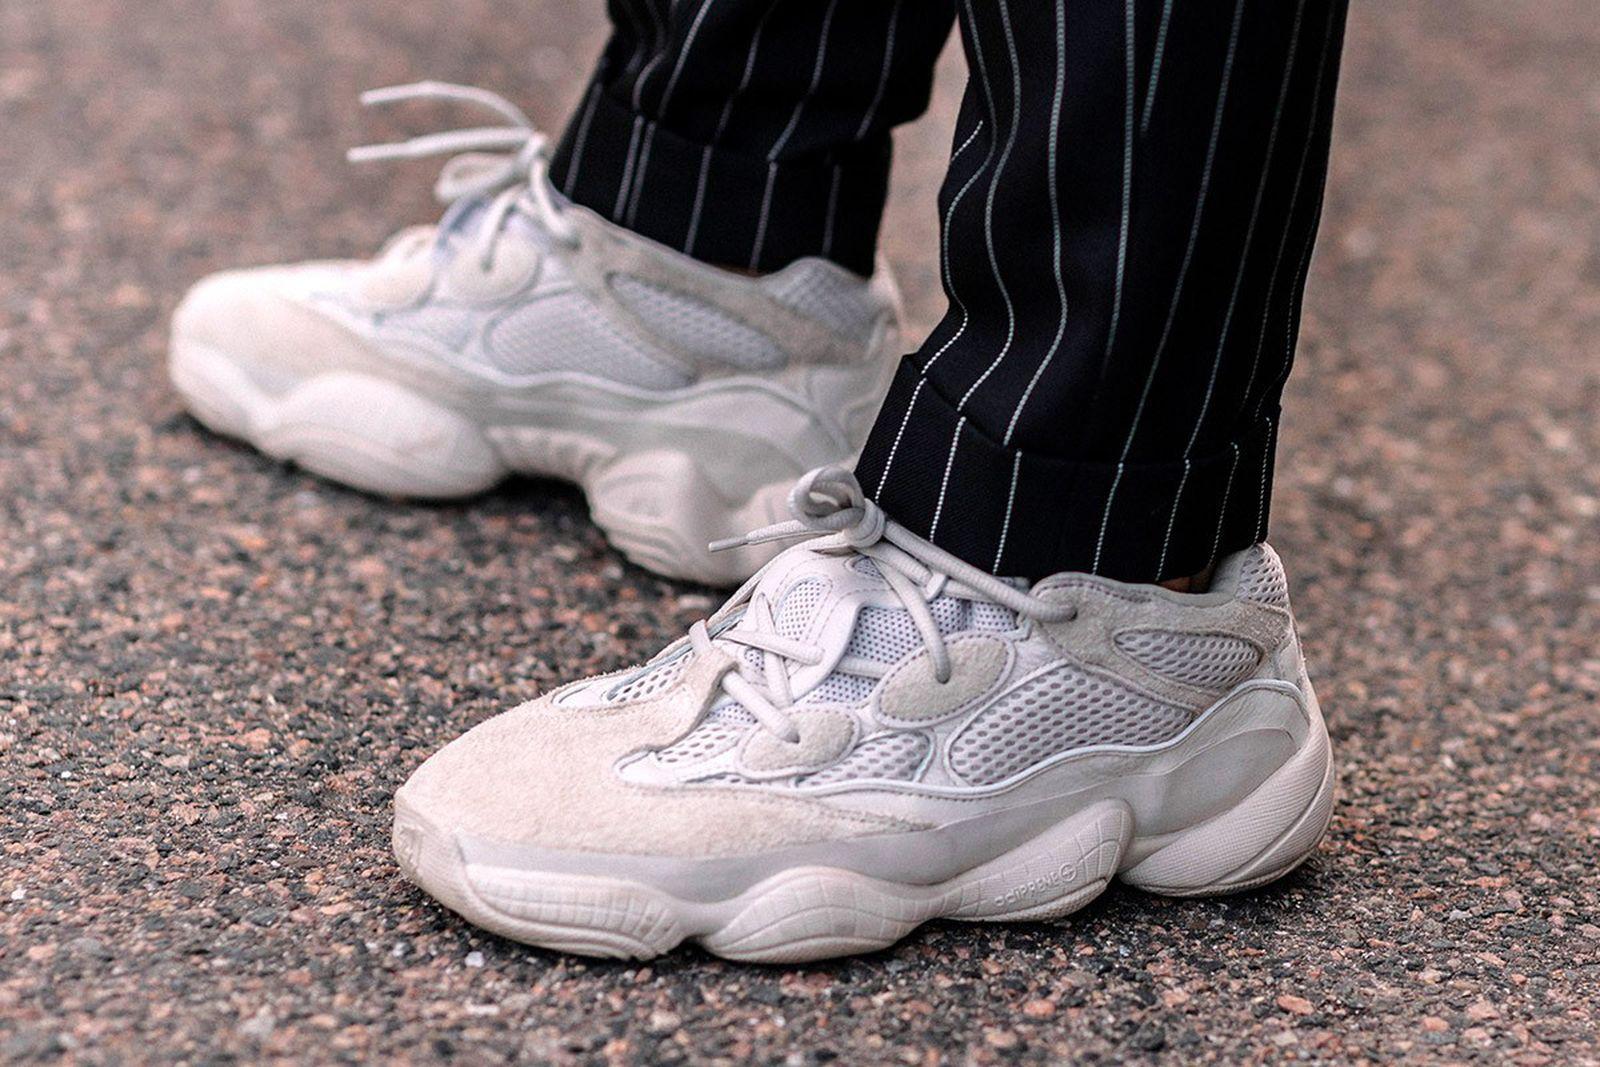 adidas YEEZY 500 sneaker